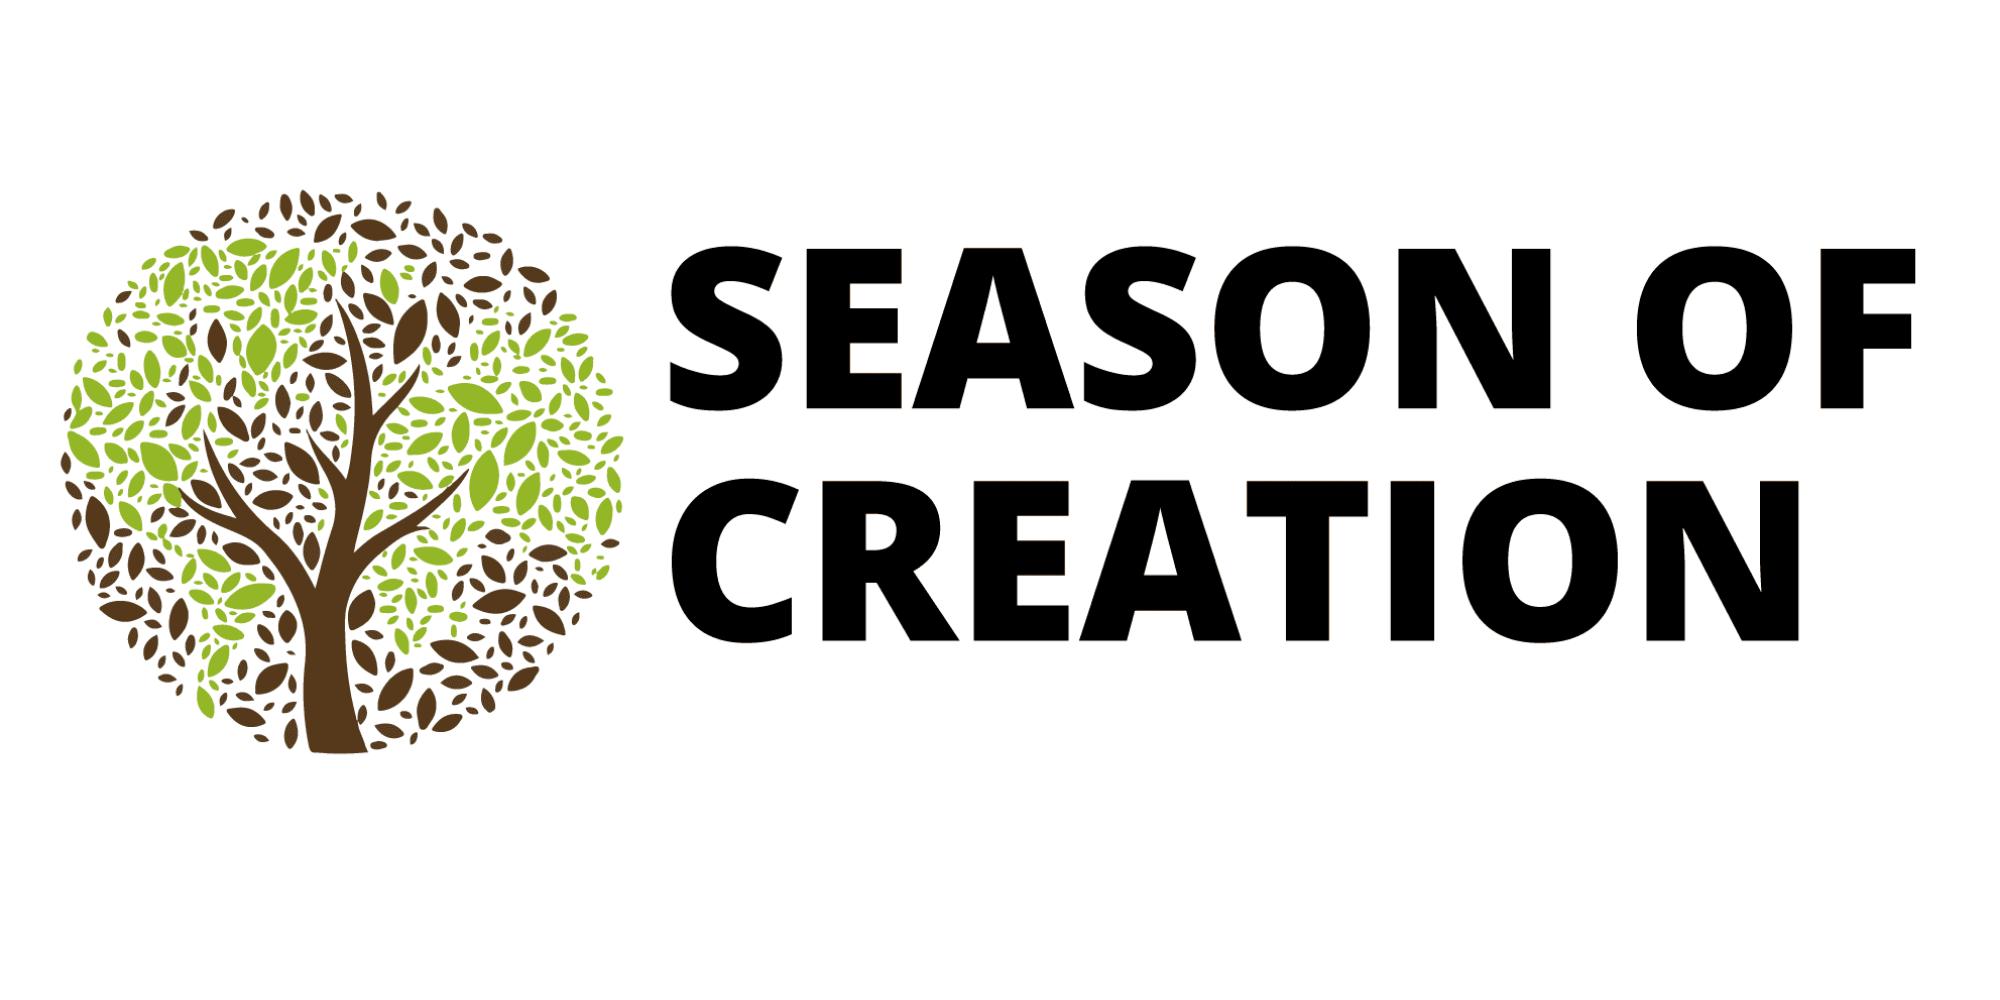 Season of Creation 2021: Renewing the Oikos of God